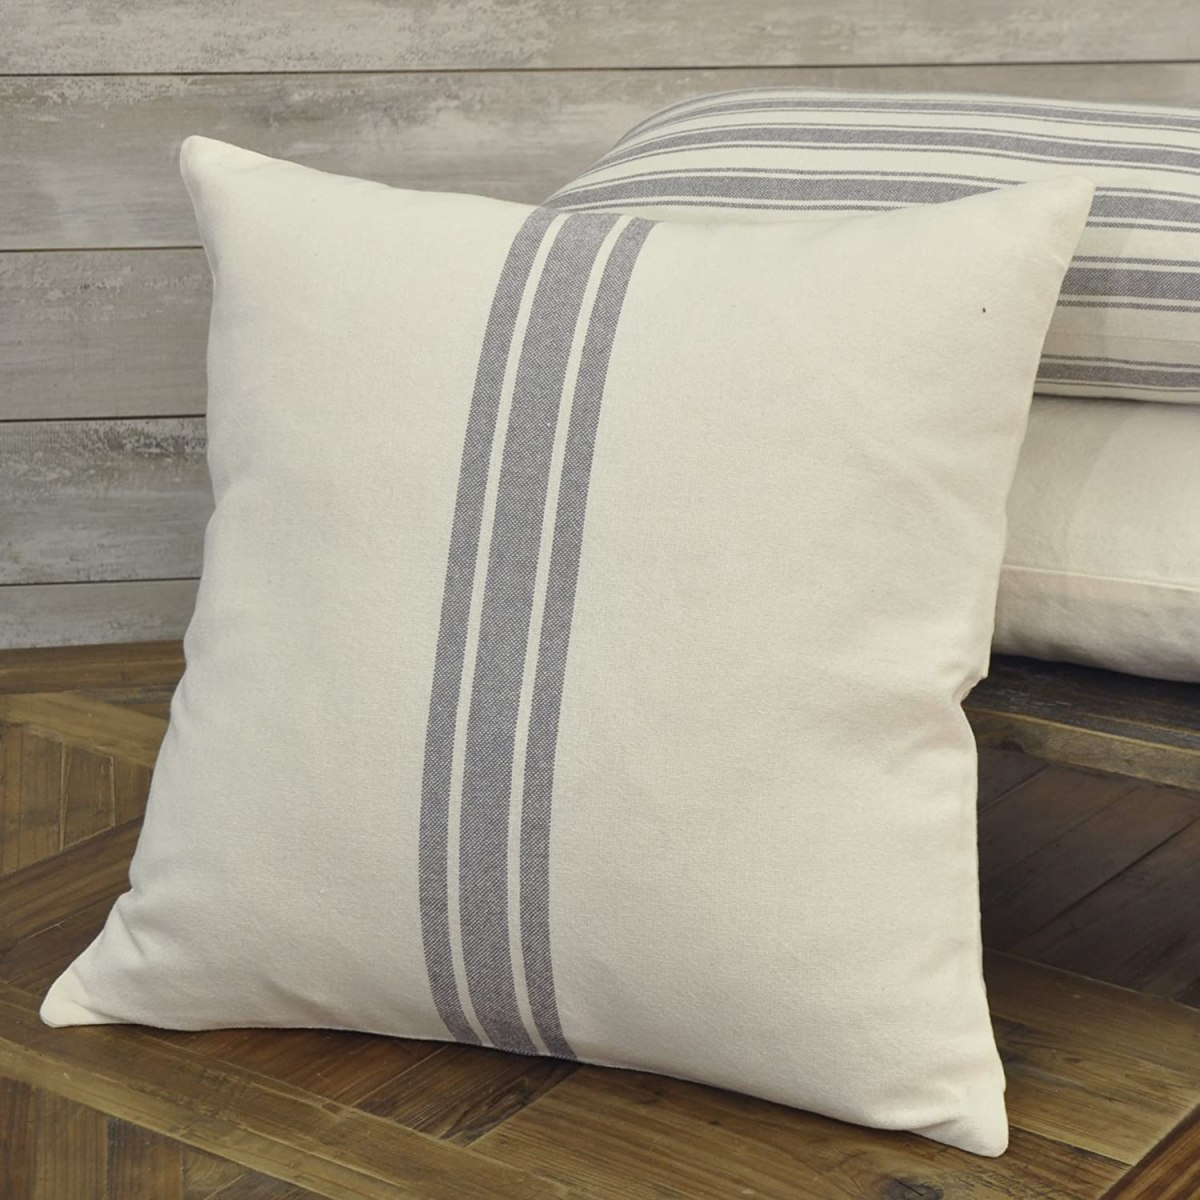 Grain-Sack-Ticking-Stripe-Pillowcase